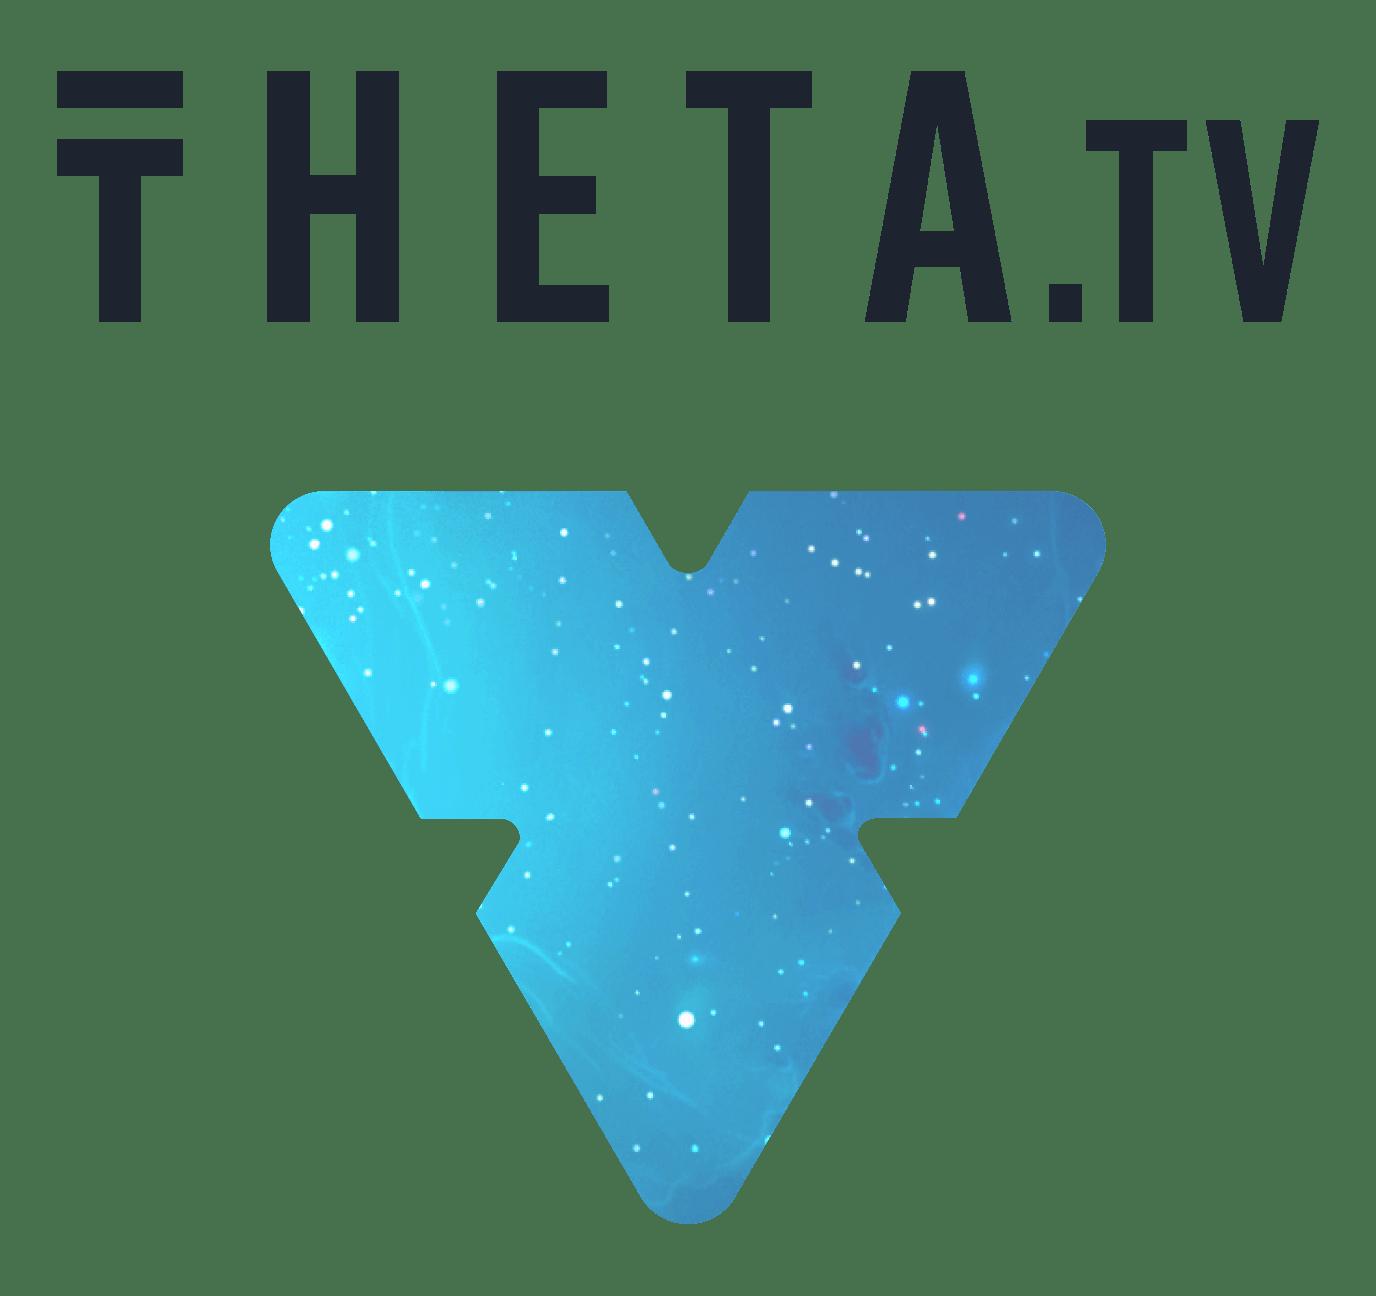 THETA.tv Community Newsletter – July 2, 2020